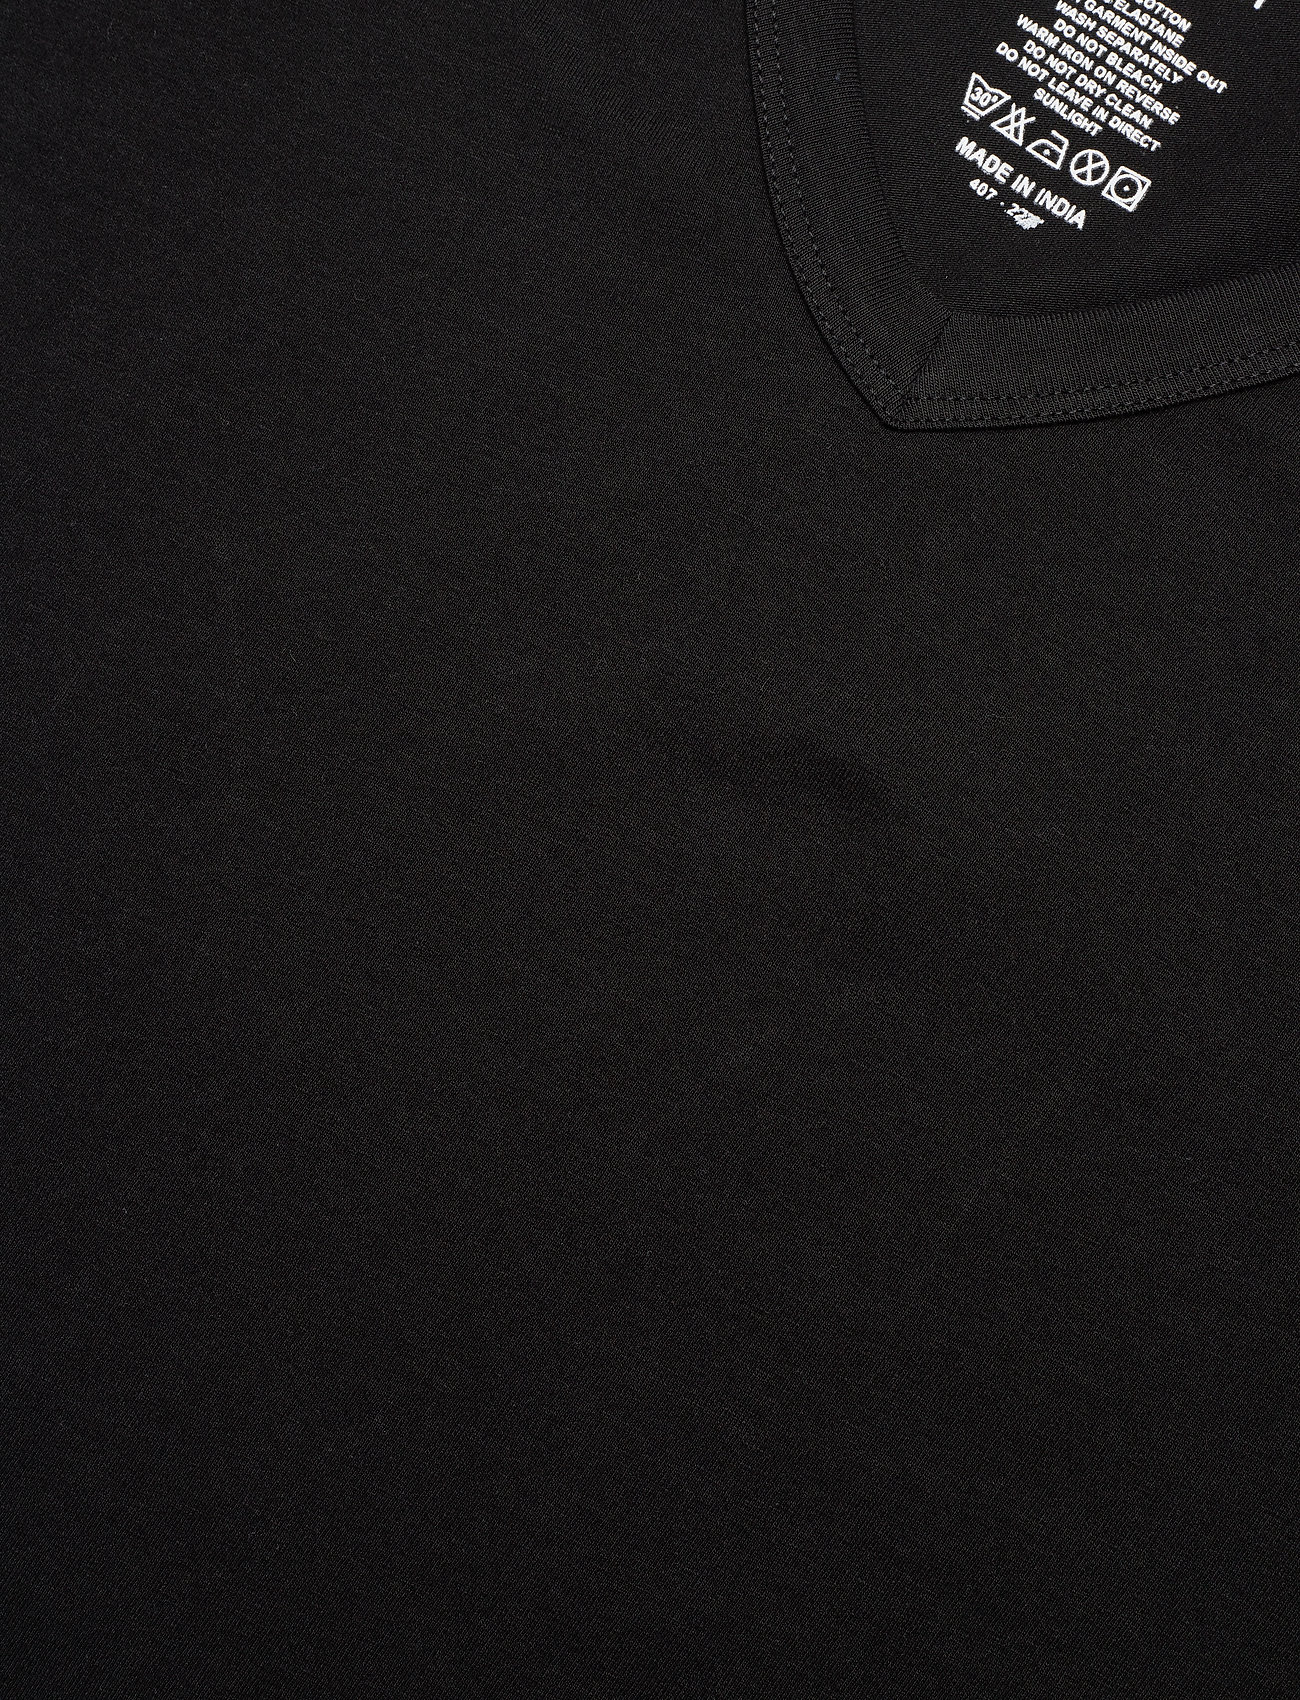 Lyle & Scott - PARKER - t-shirts basiques - black/grey marl/bright white - 1